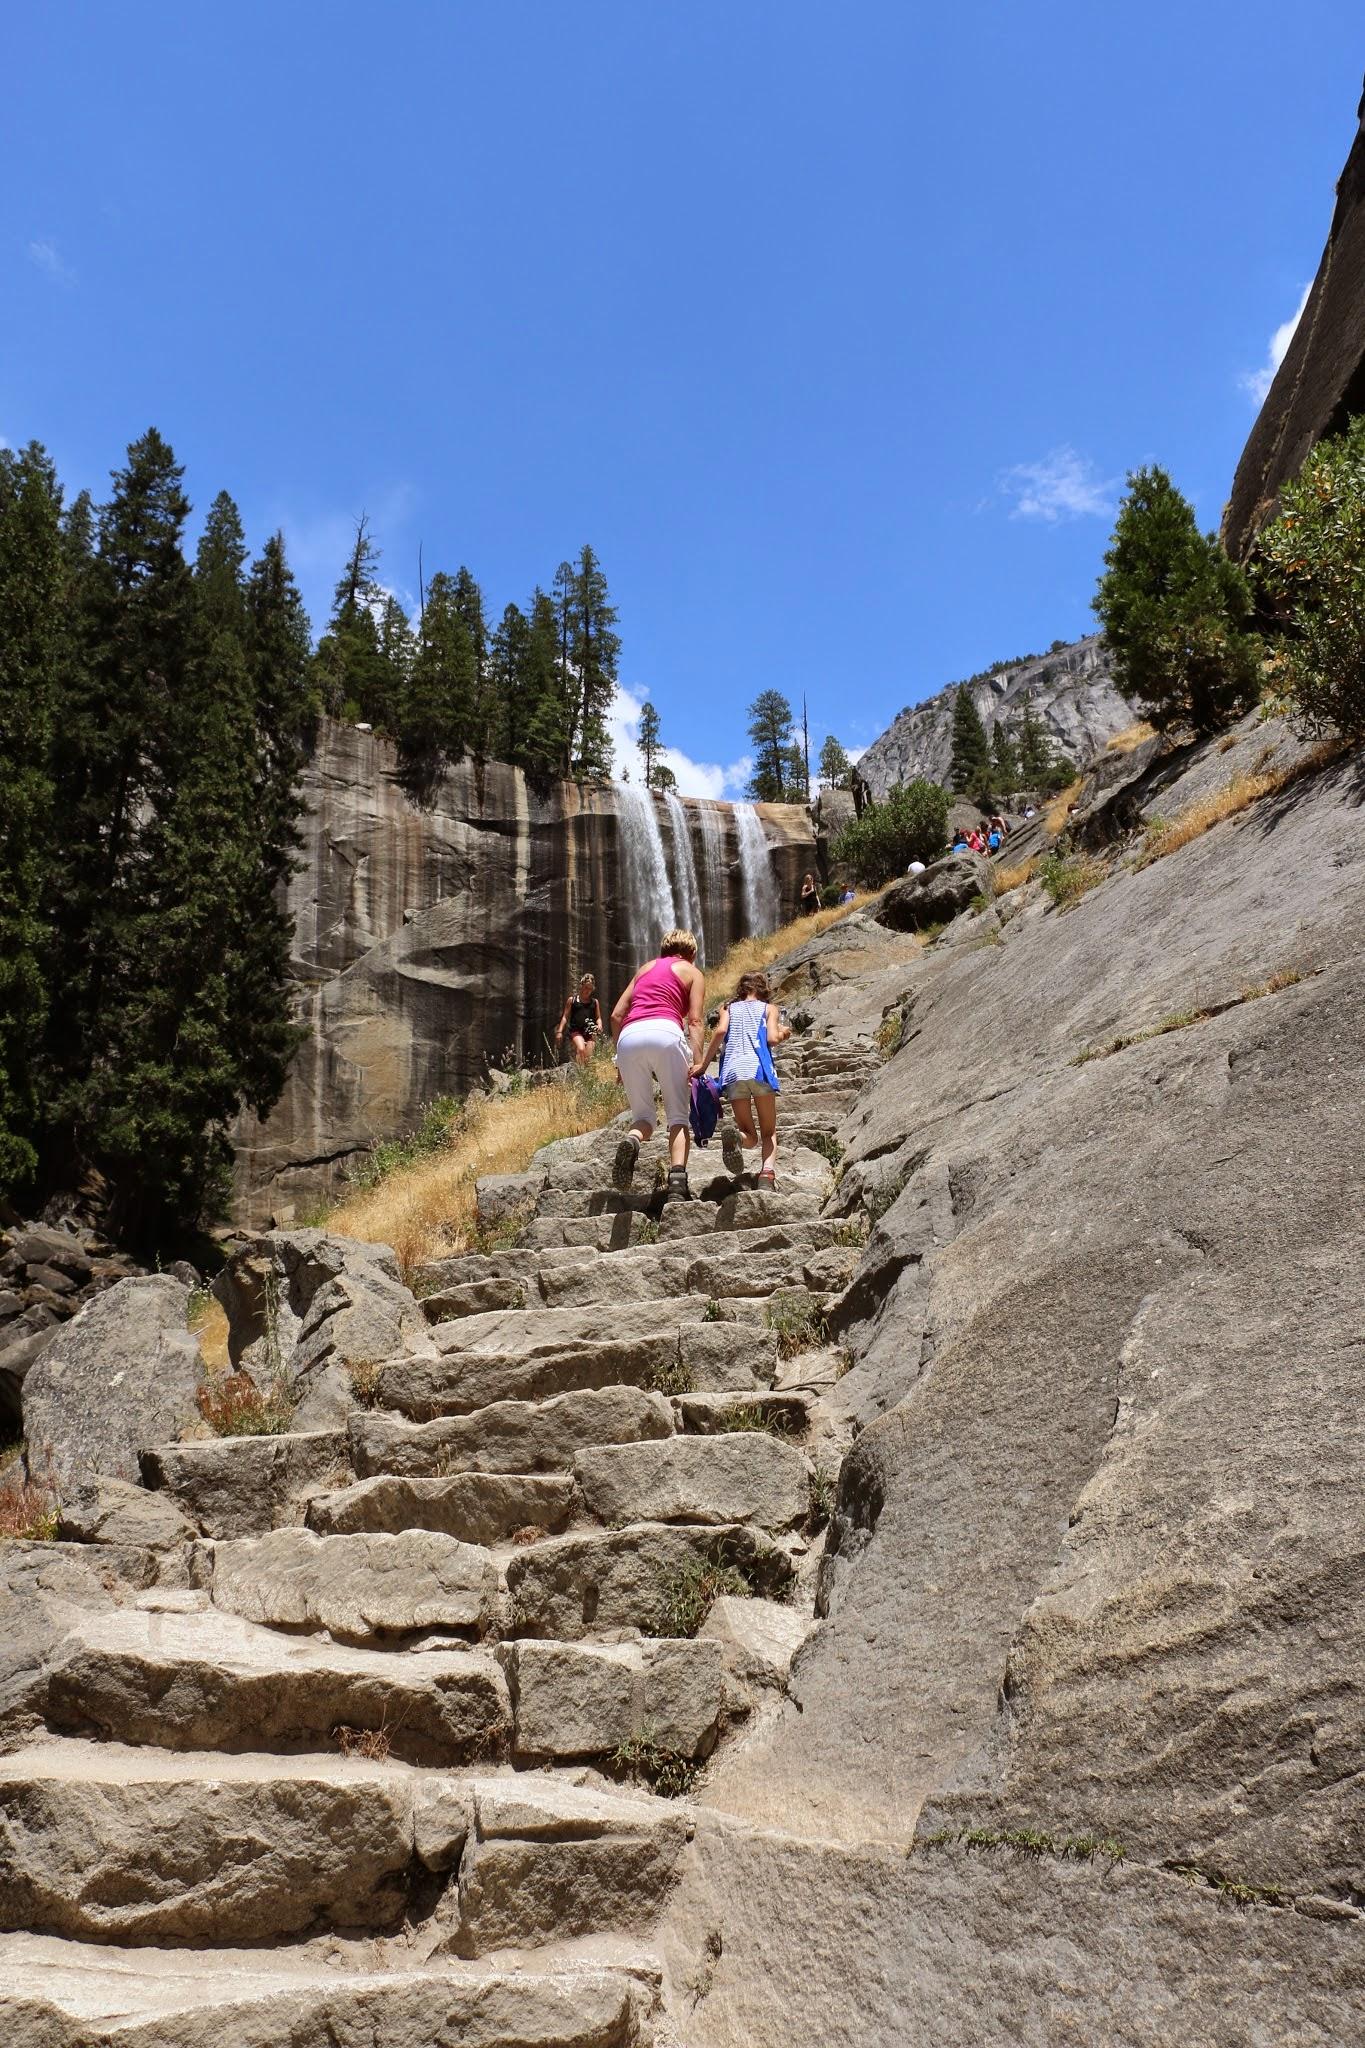 Wandeling naar de Vernal Fall in Yosemite